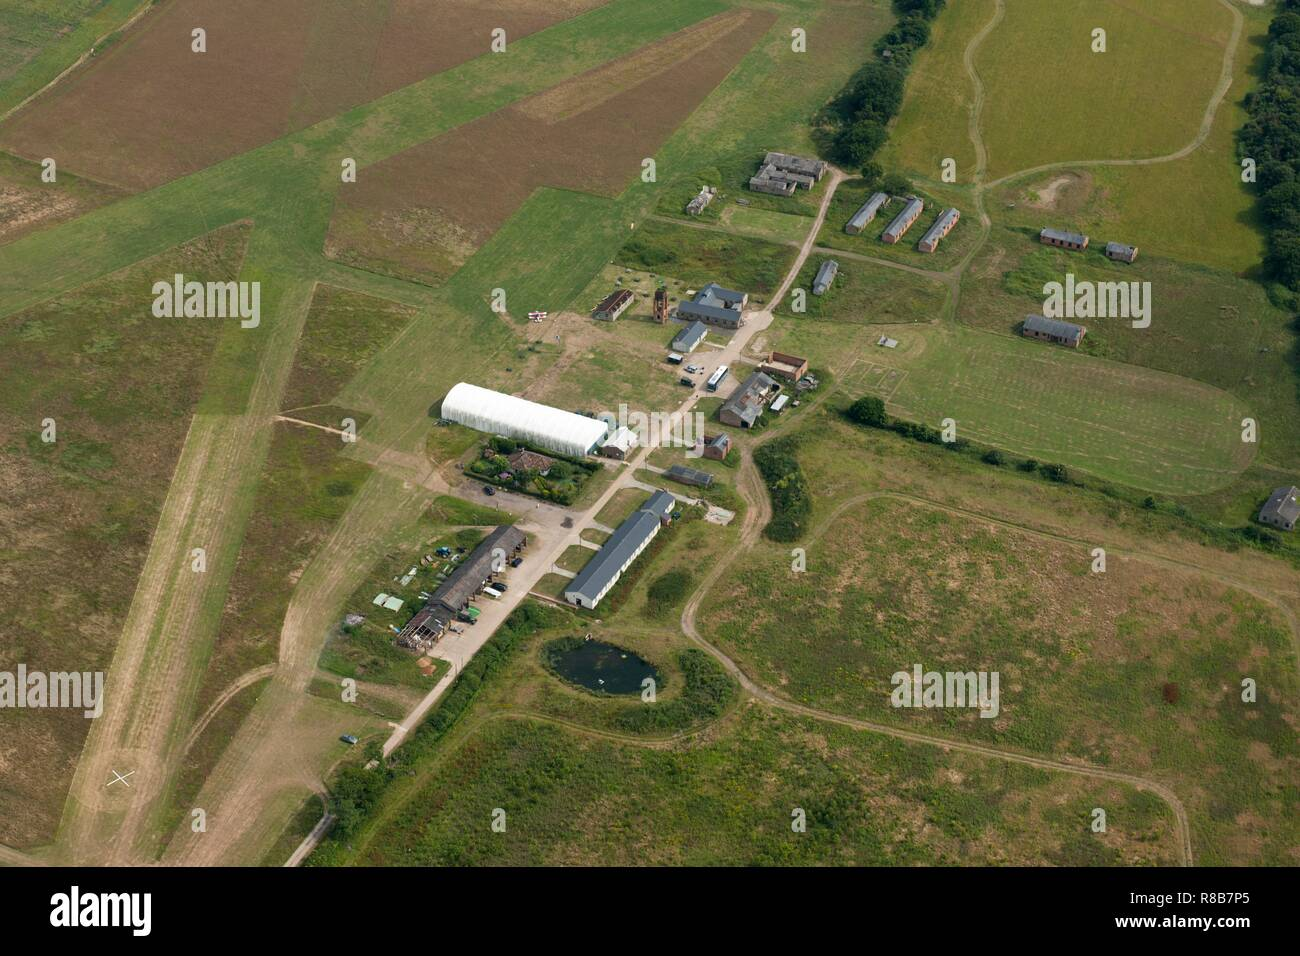 Stow Maries World War I Aerodrome, Maldon, Essex, 2014. - Stock Image